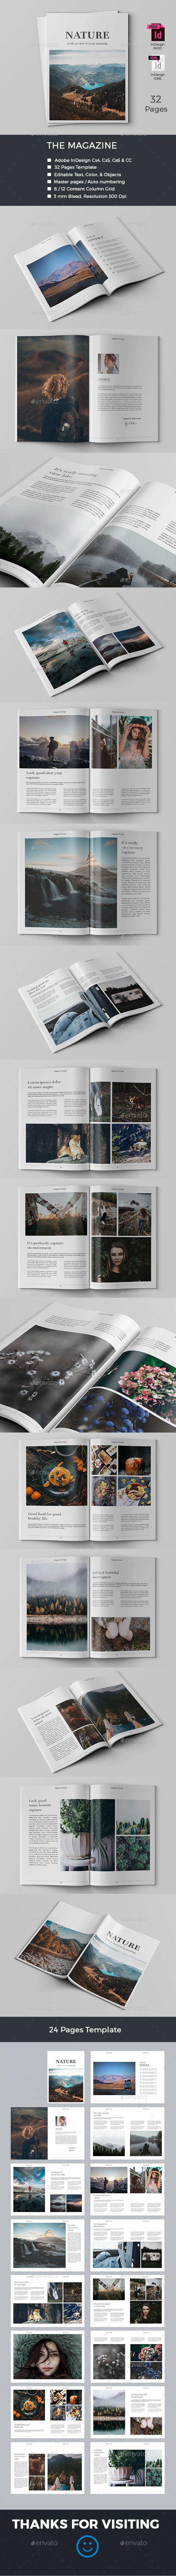 The Magazine — InDesign INDD #portfolio #magazine design • Available here ➝ https://graphicriver.net/item/the-magazine/20826498?ref=pxcr